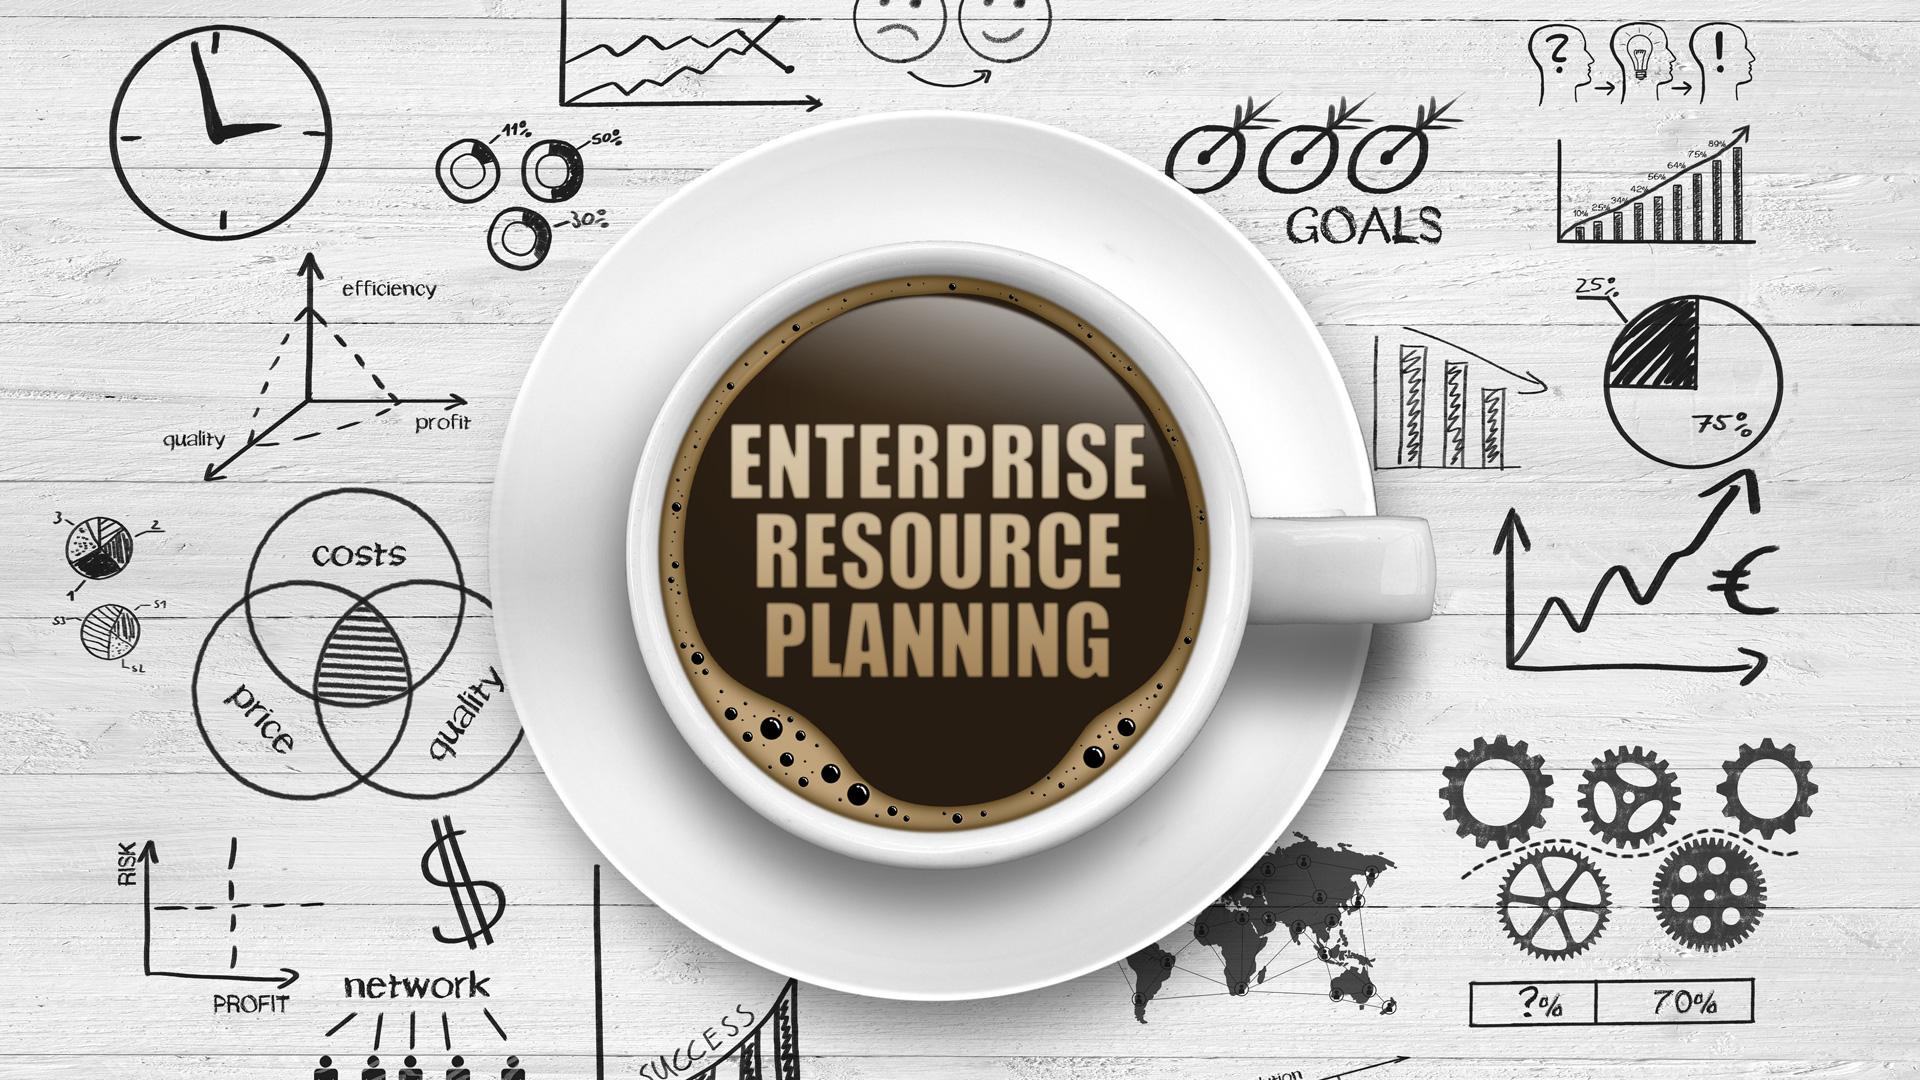 Un partner esperto, una metodologia comprovata, un Erp 4.0